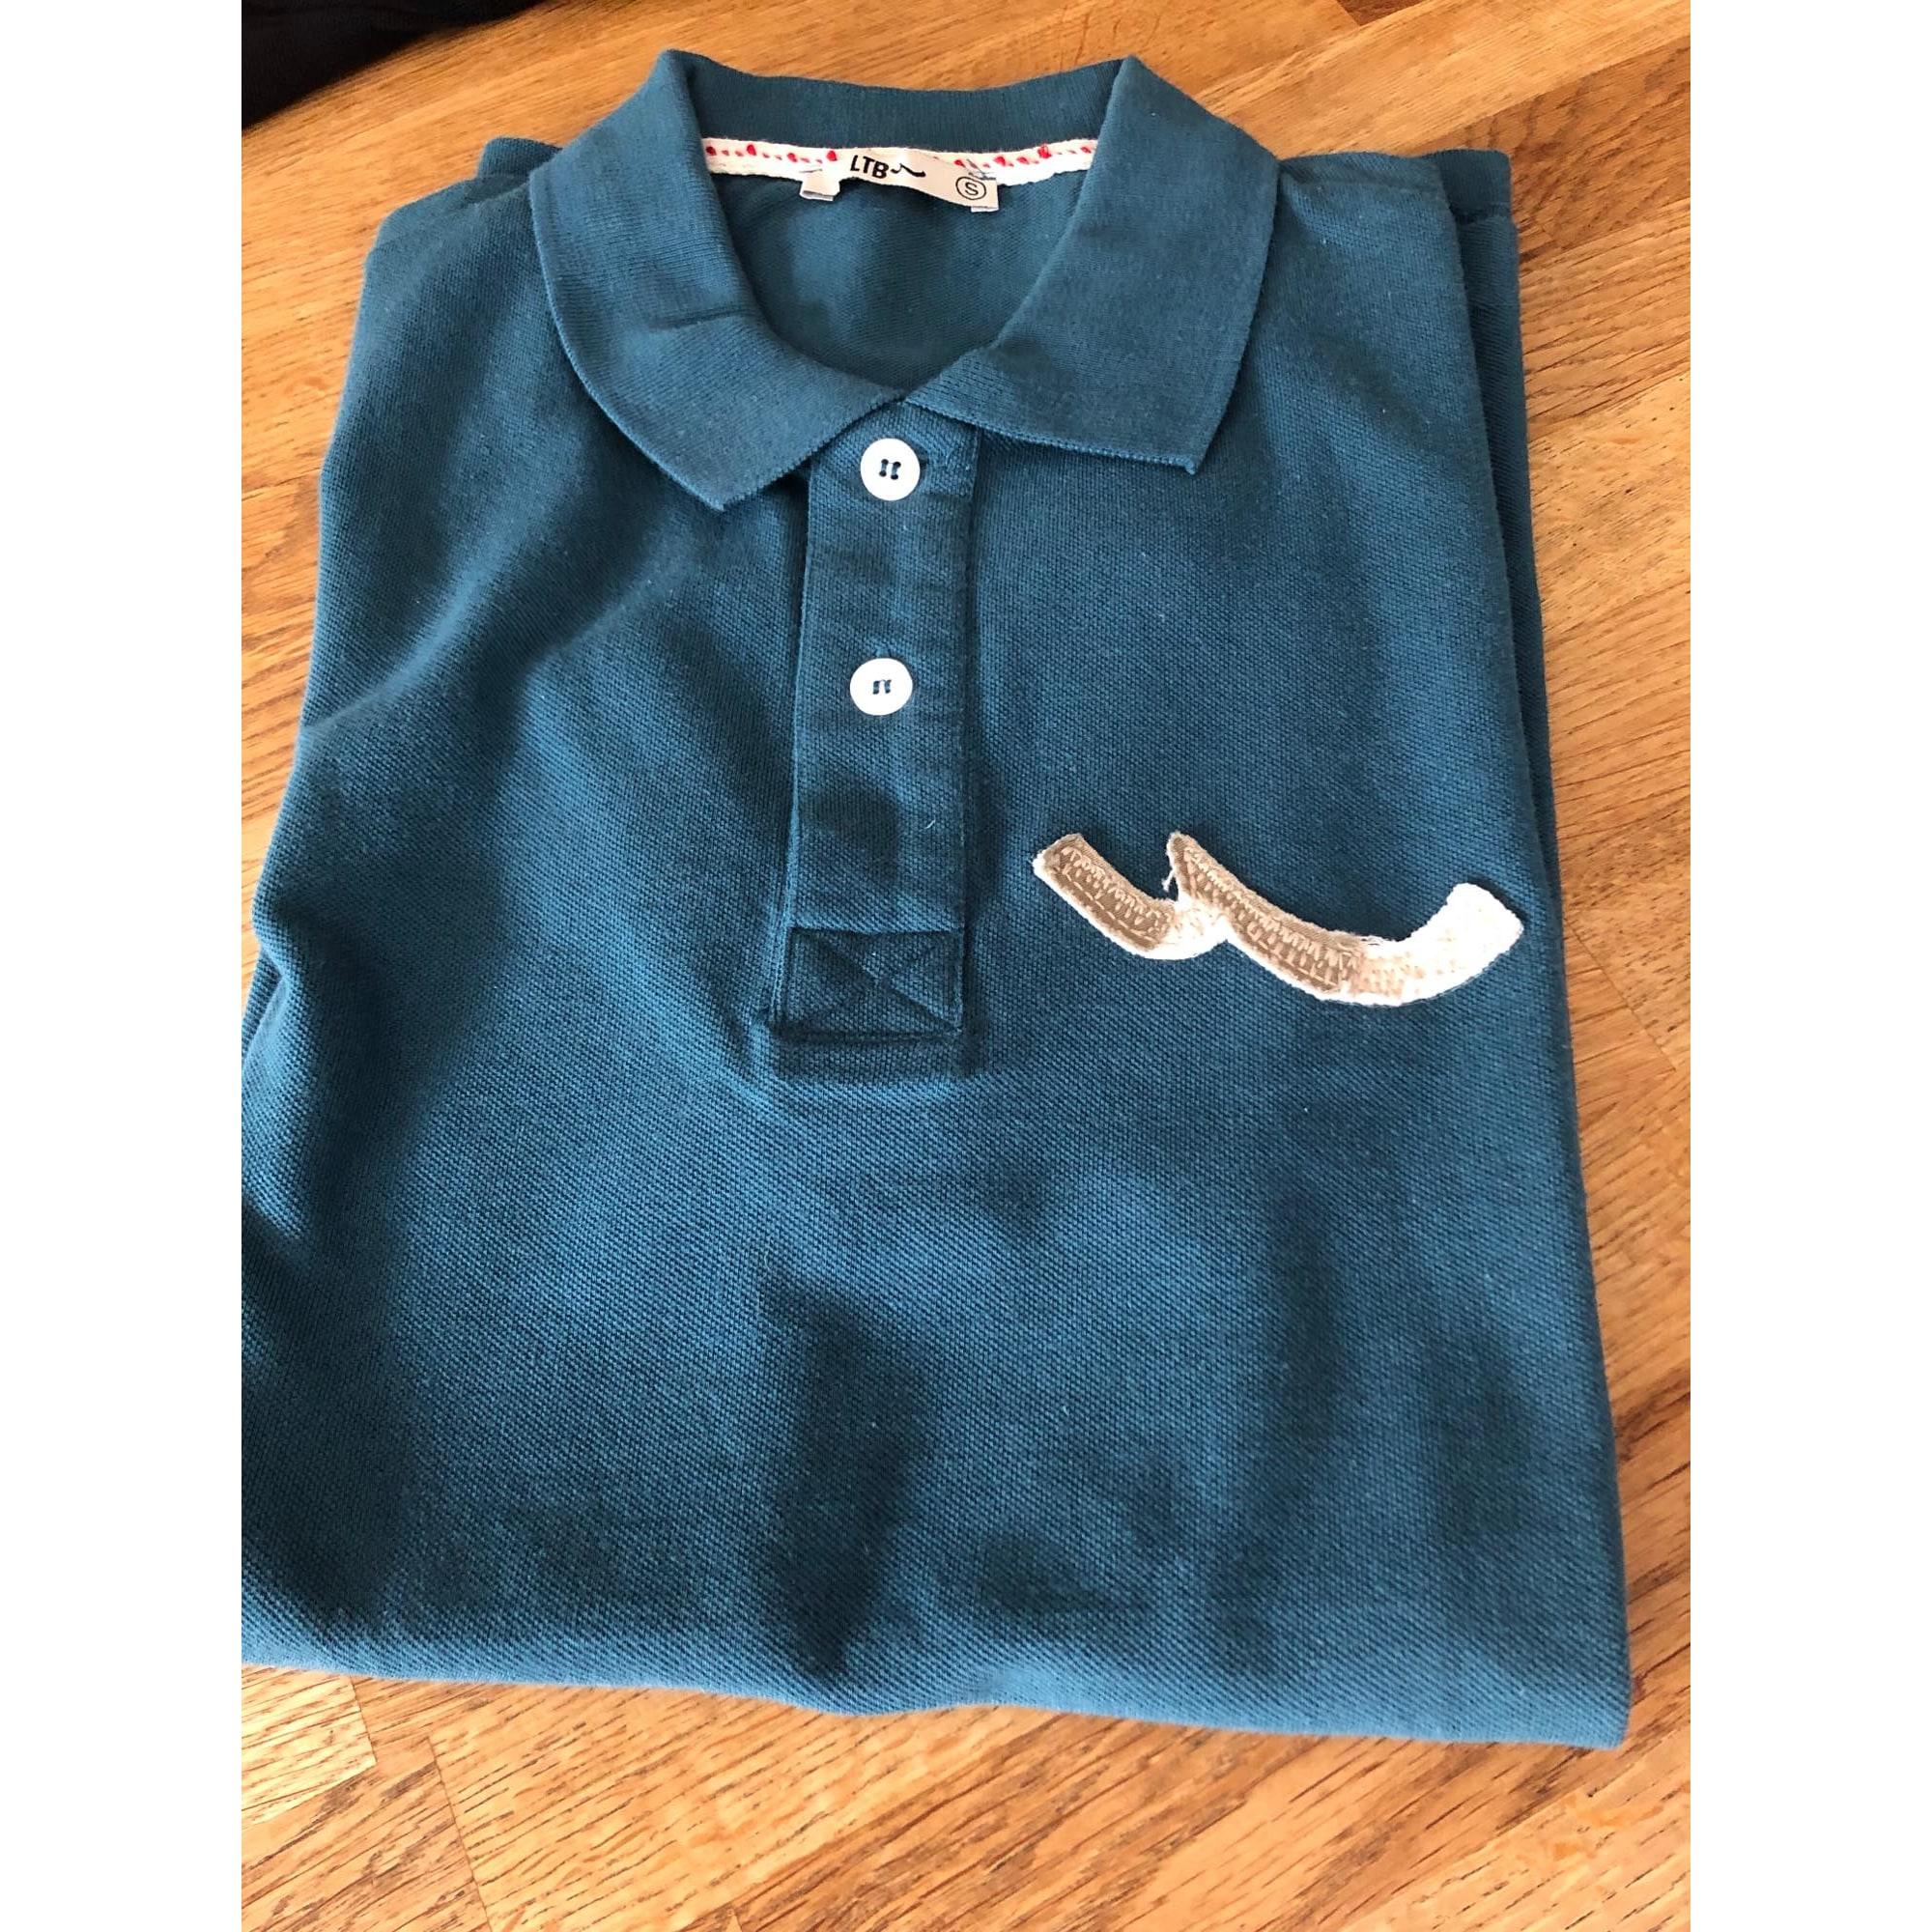 Polo LTB Bleu, bleu marine, bleu turquoise